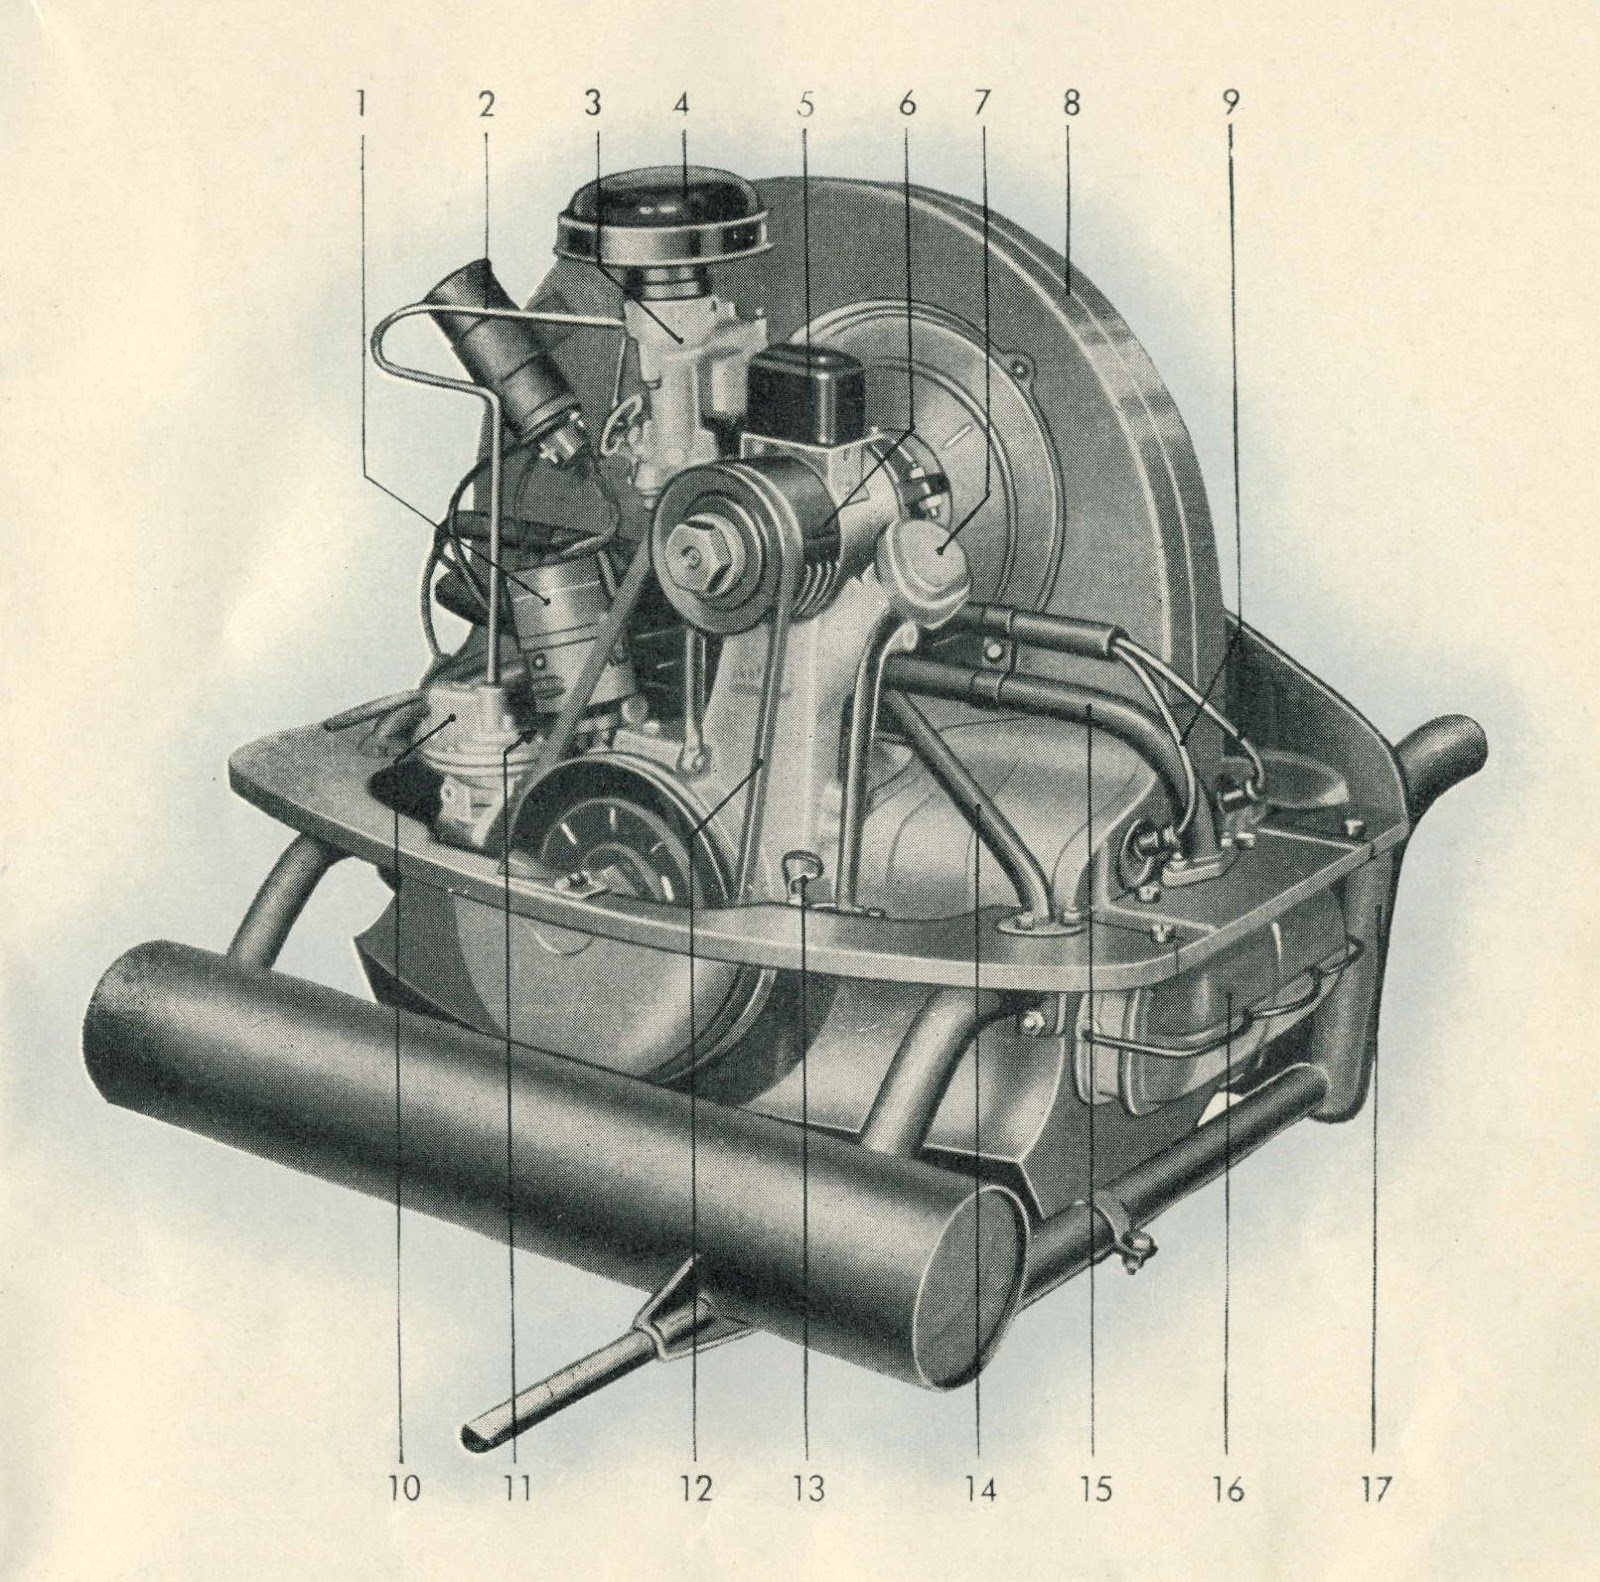 1985 Corvette Cooling Fan Wiring Diagram Australian Trailer Plug 7 Way C5 Free Download 1988